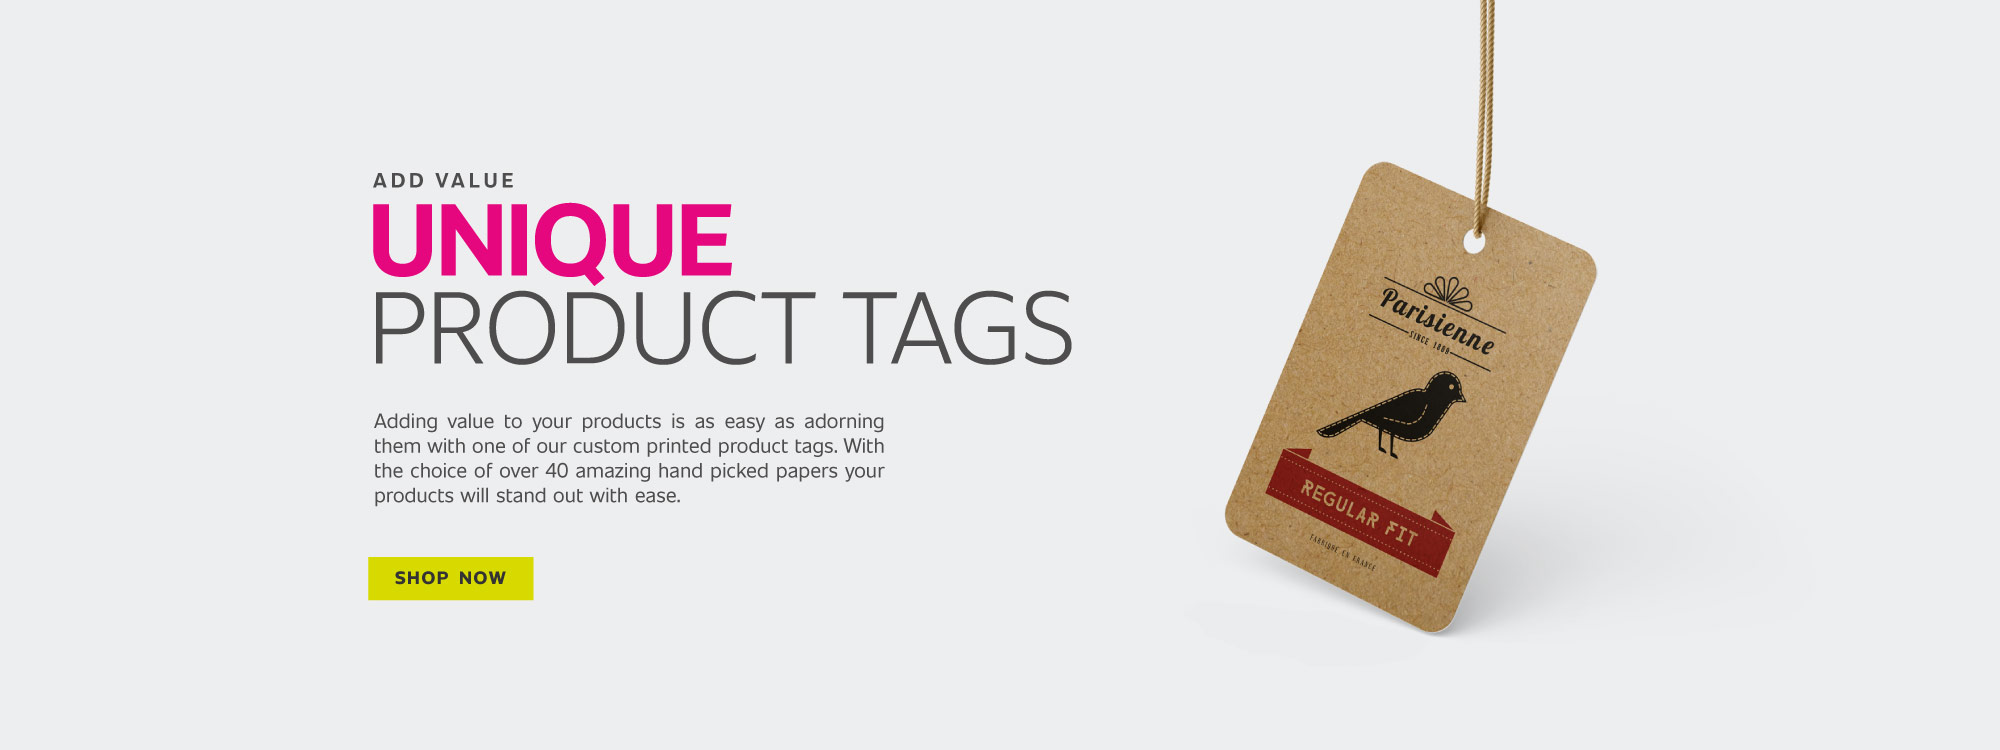 AuraPrint Home Page Banner